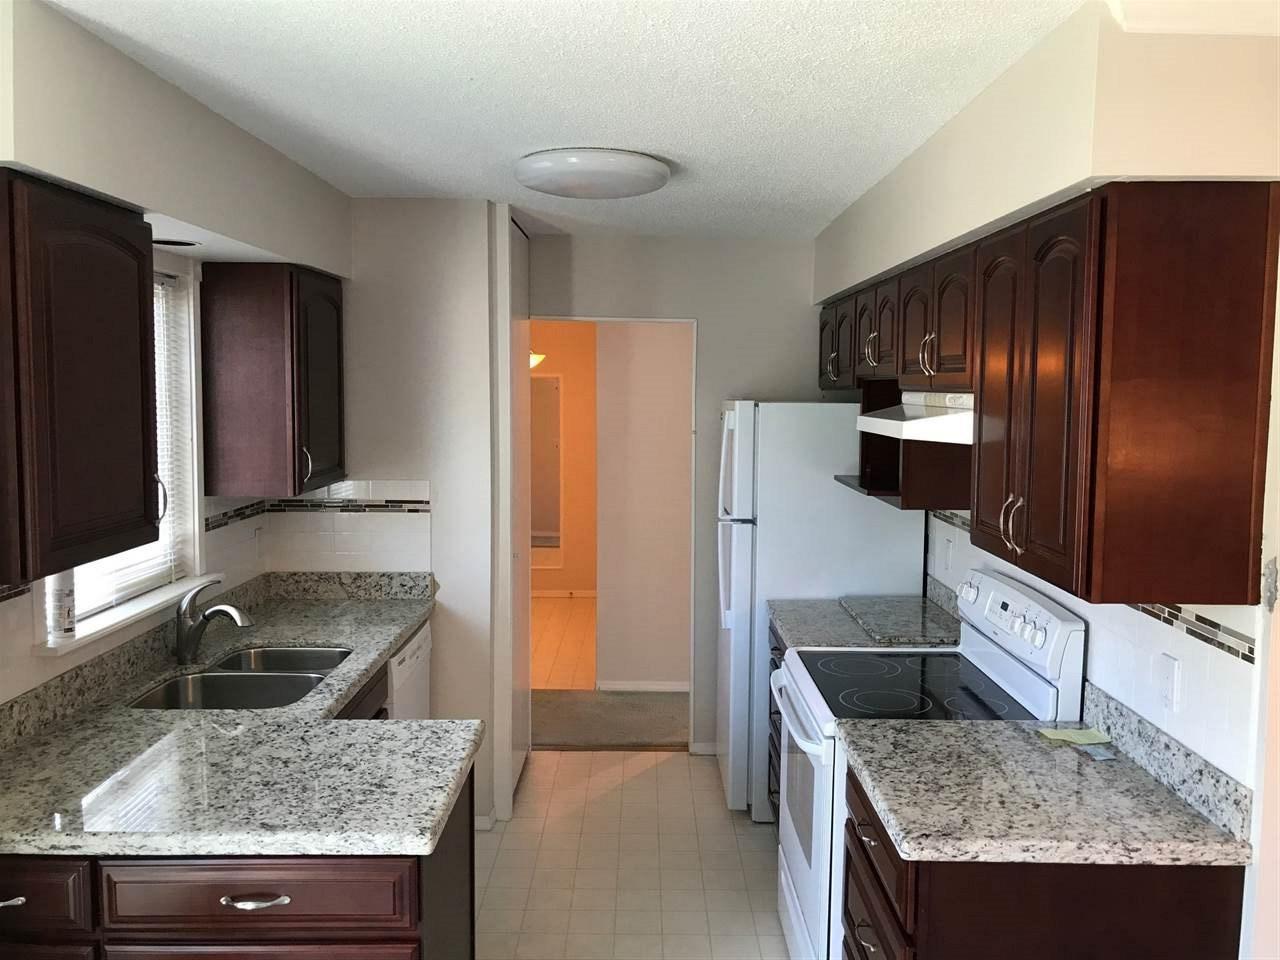 Condo Apartment at 303 1351 MARTIN STREET, Unit 303, South Surrey White Rock, British Columbia. Image 4